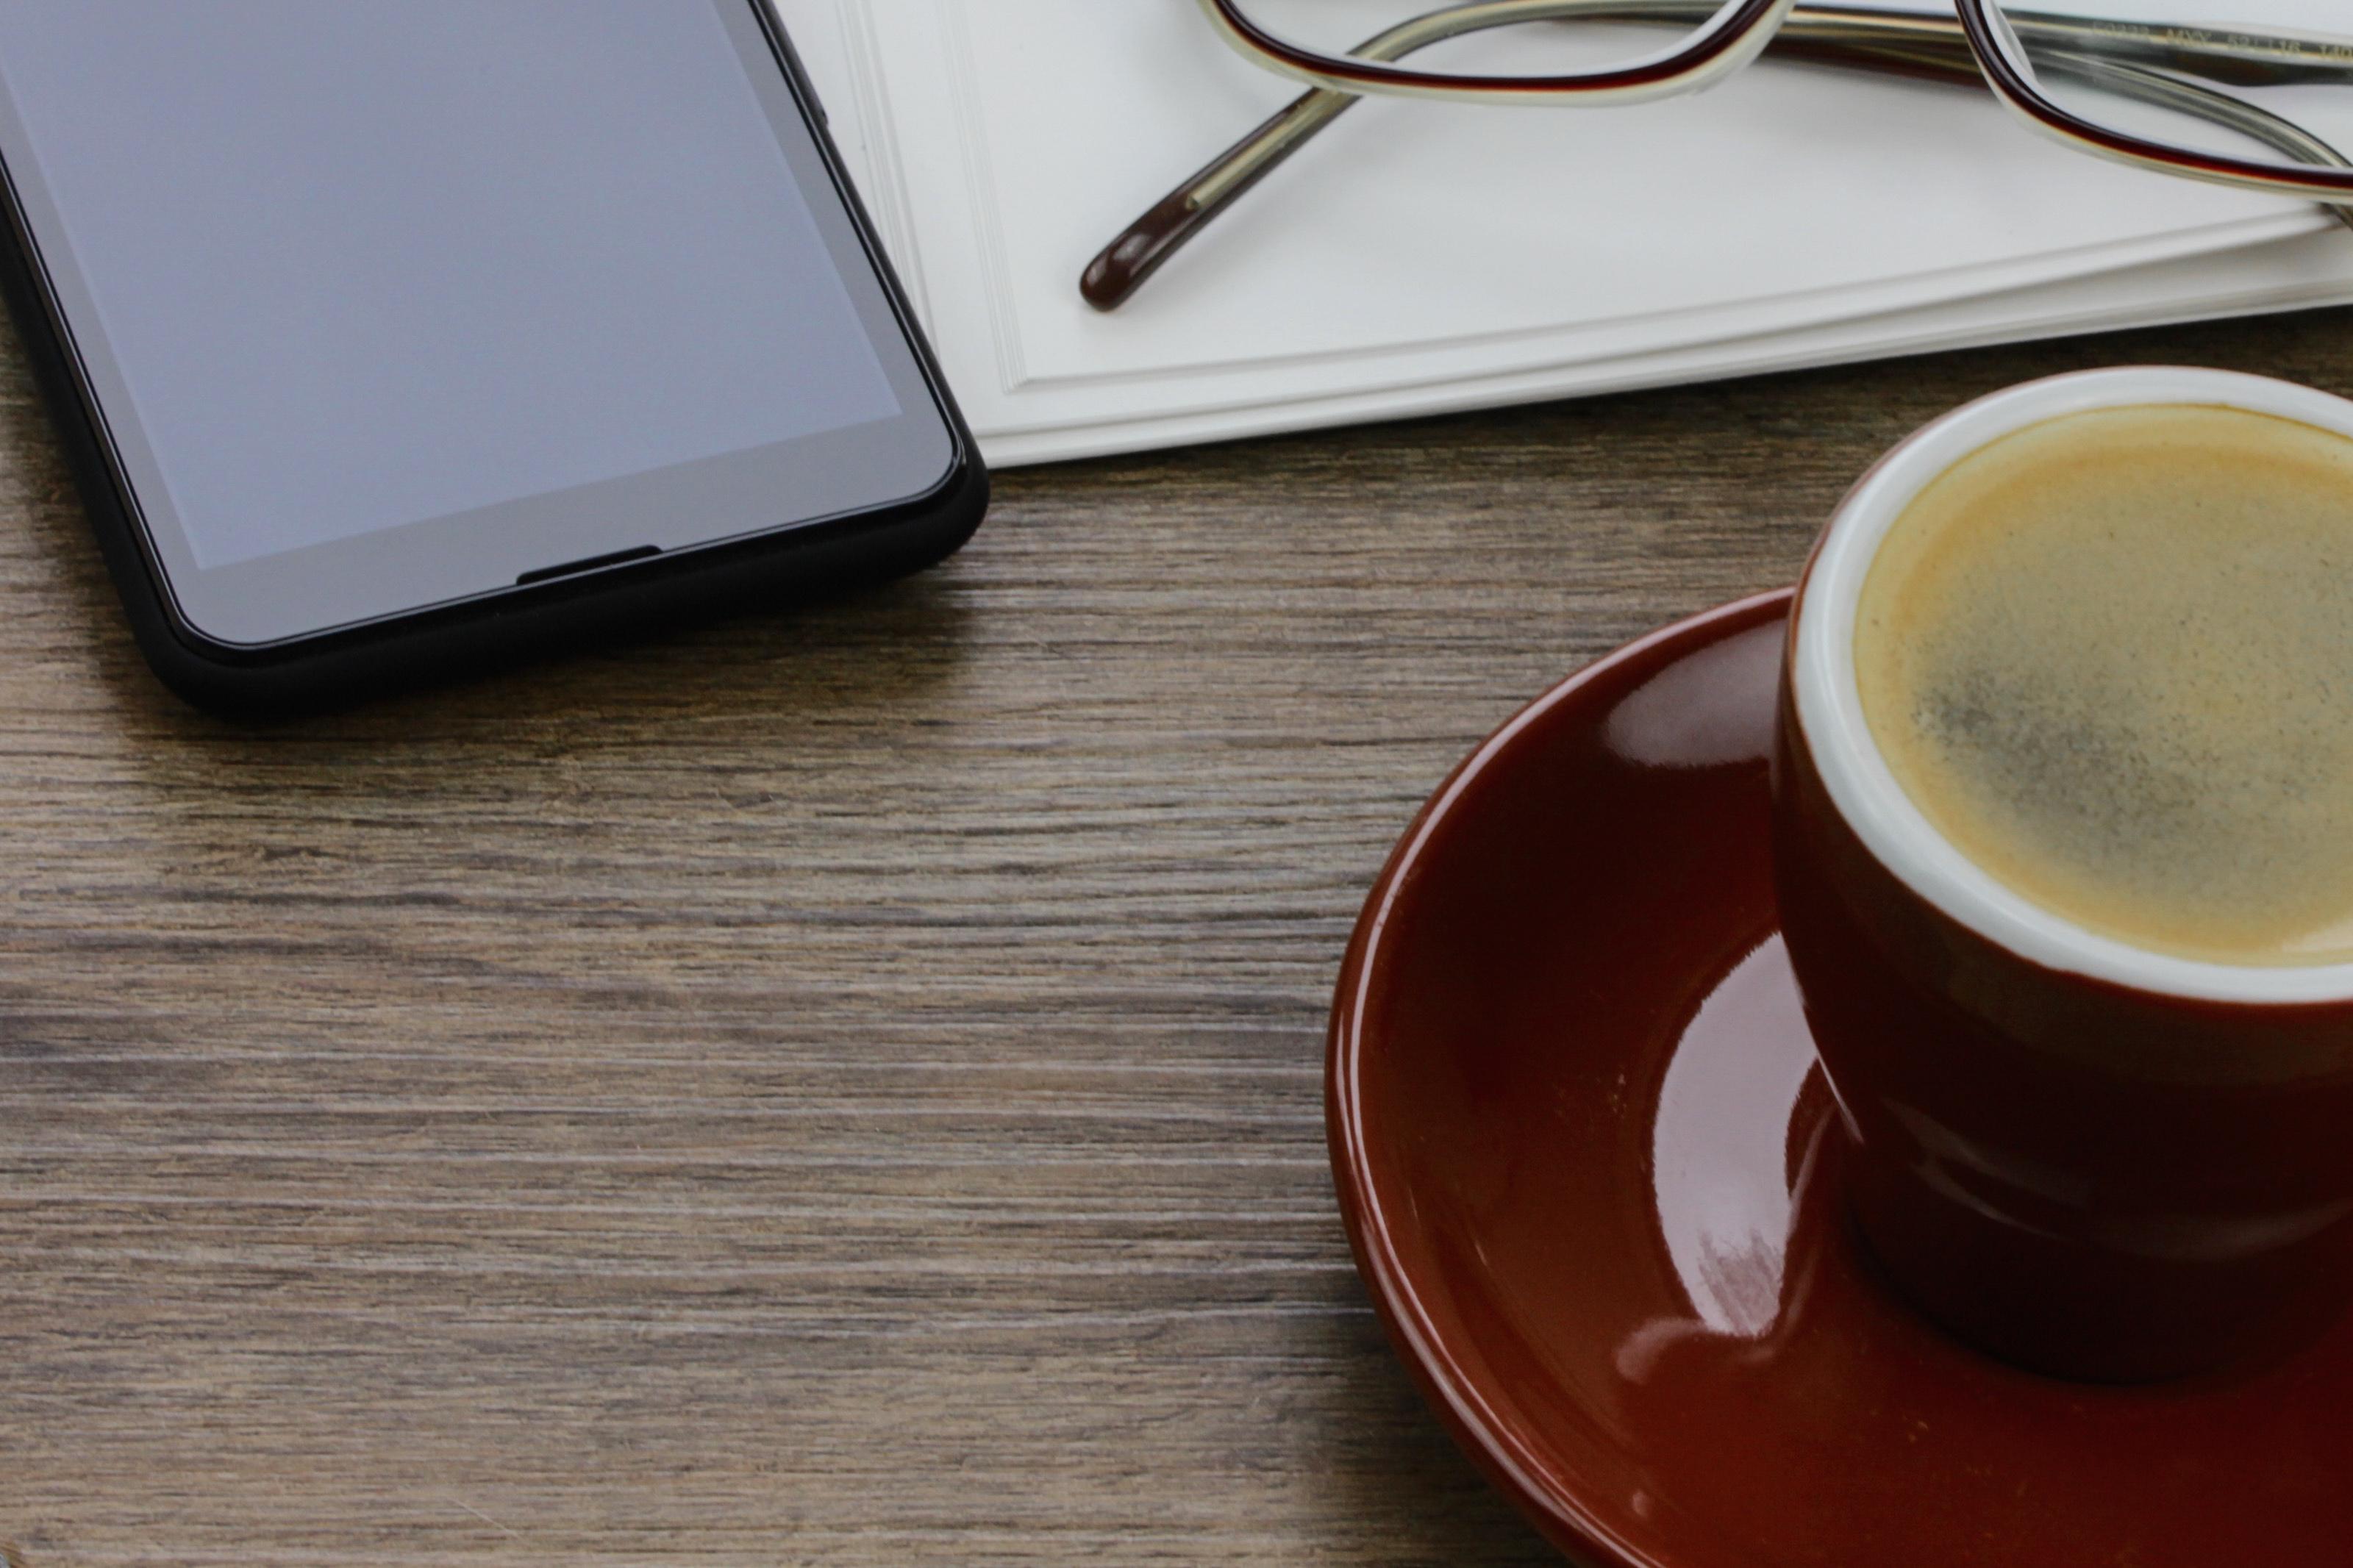 phone, glasses, notebook, espresso